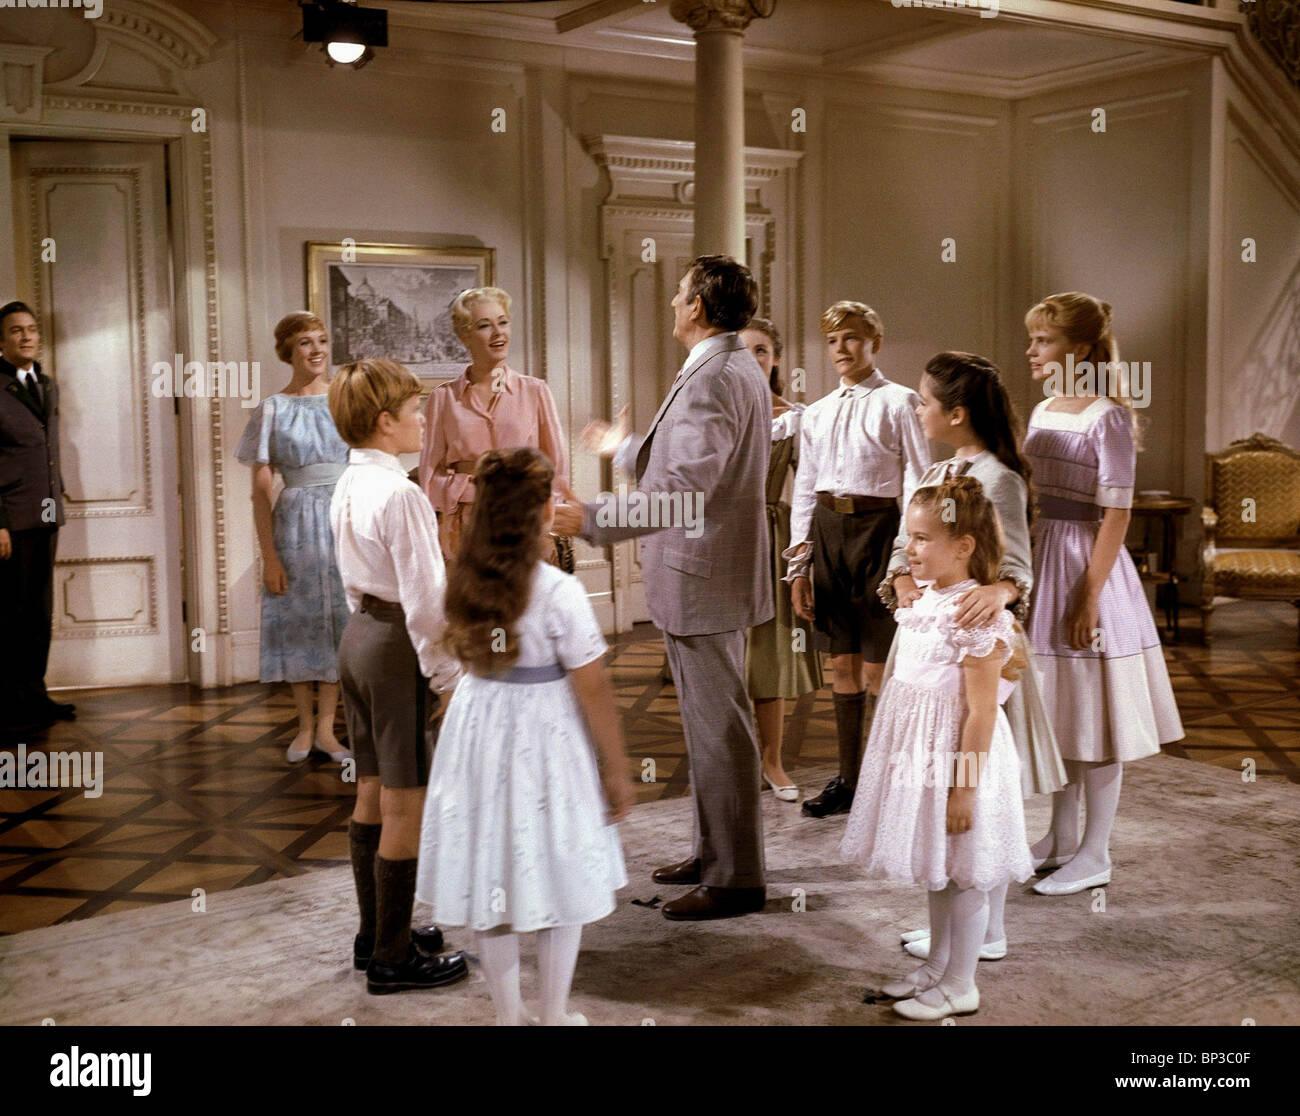 CHRISTOPHER PLUMMER Julie Andrews y emitir el sonido de la música (1965) Imagen De Stock